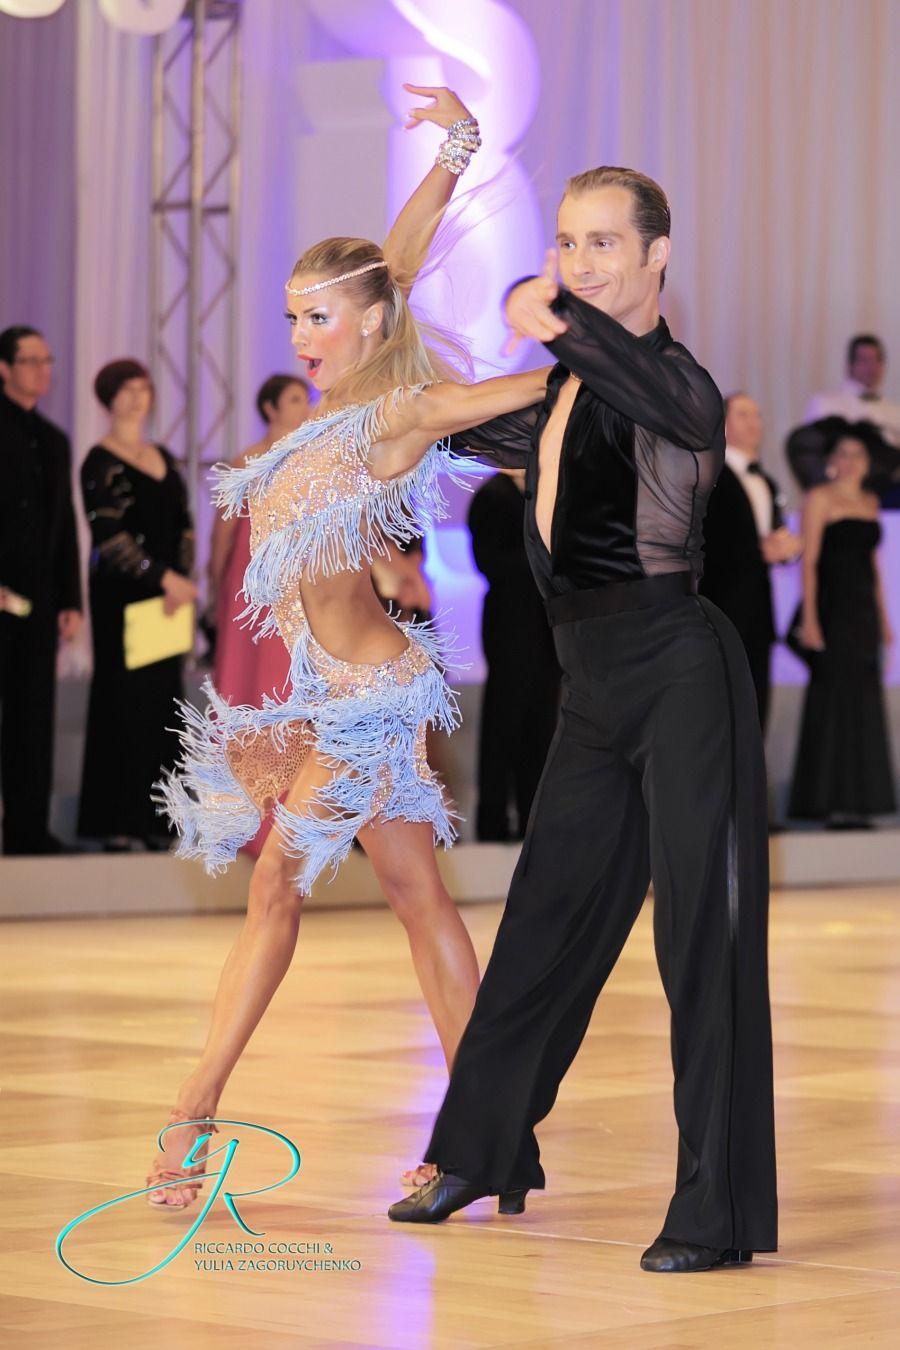 Ballroom Dancing | Ballroom Dance | Pinterest | Ballroom dancing ...